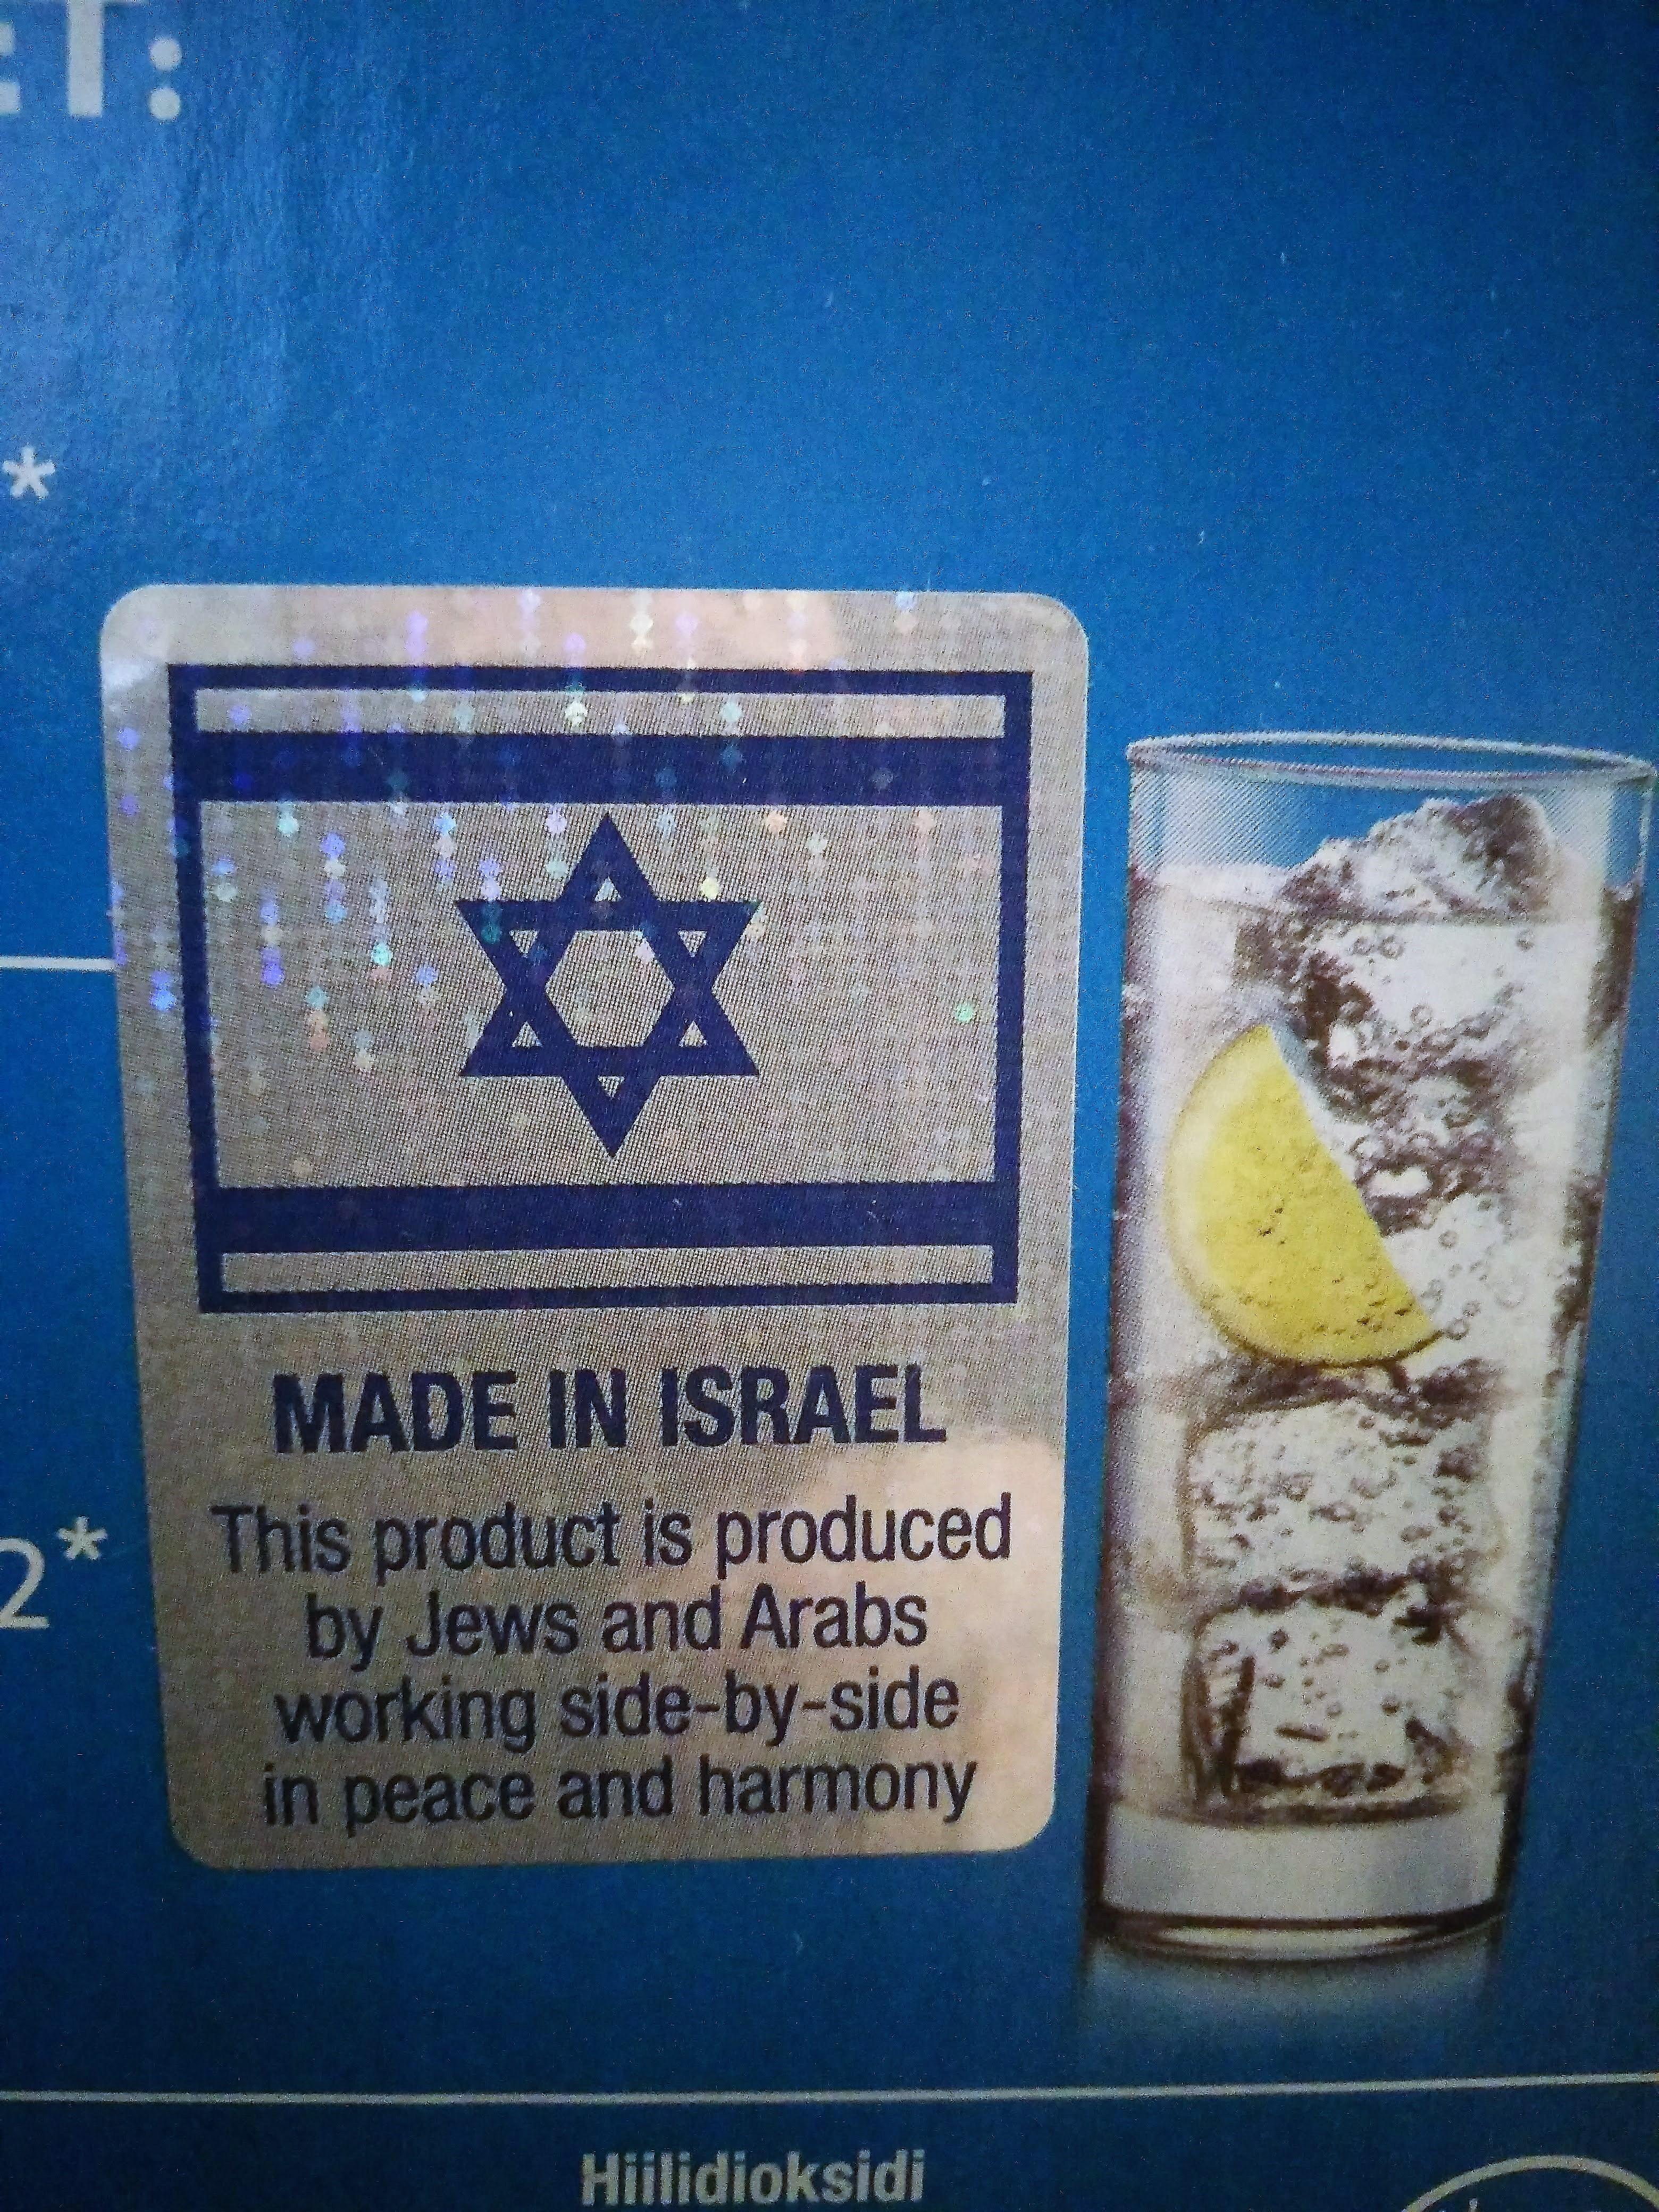 Così, en passant, un'etichetta di pace